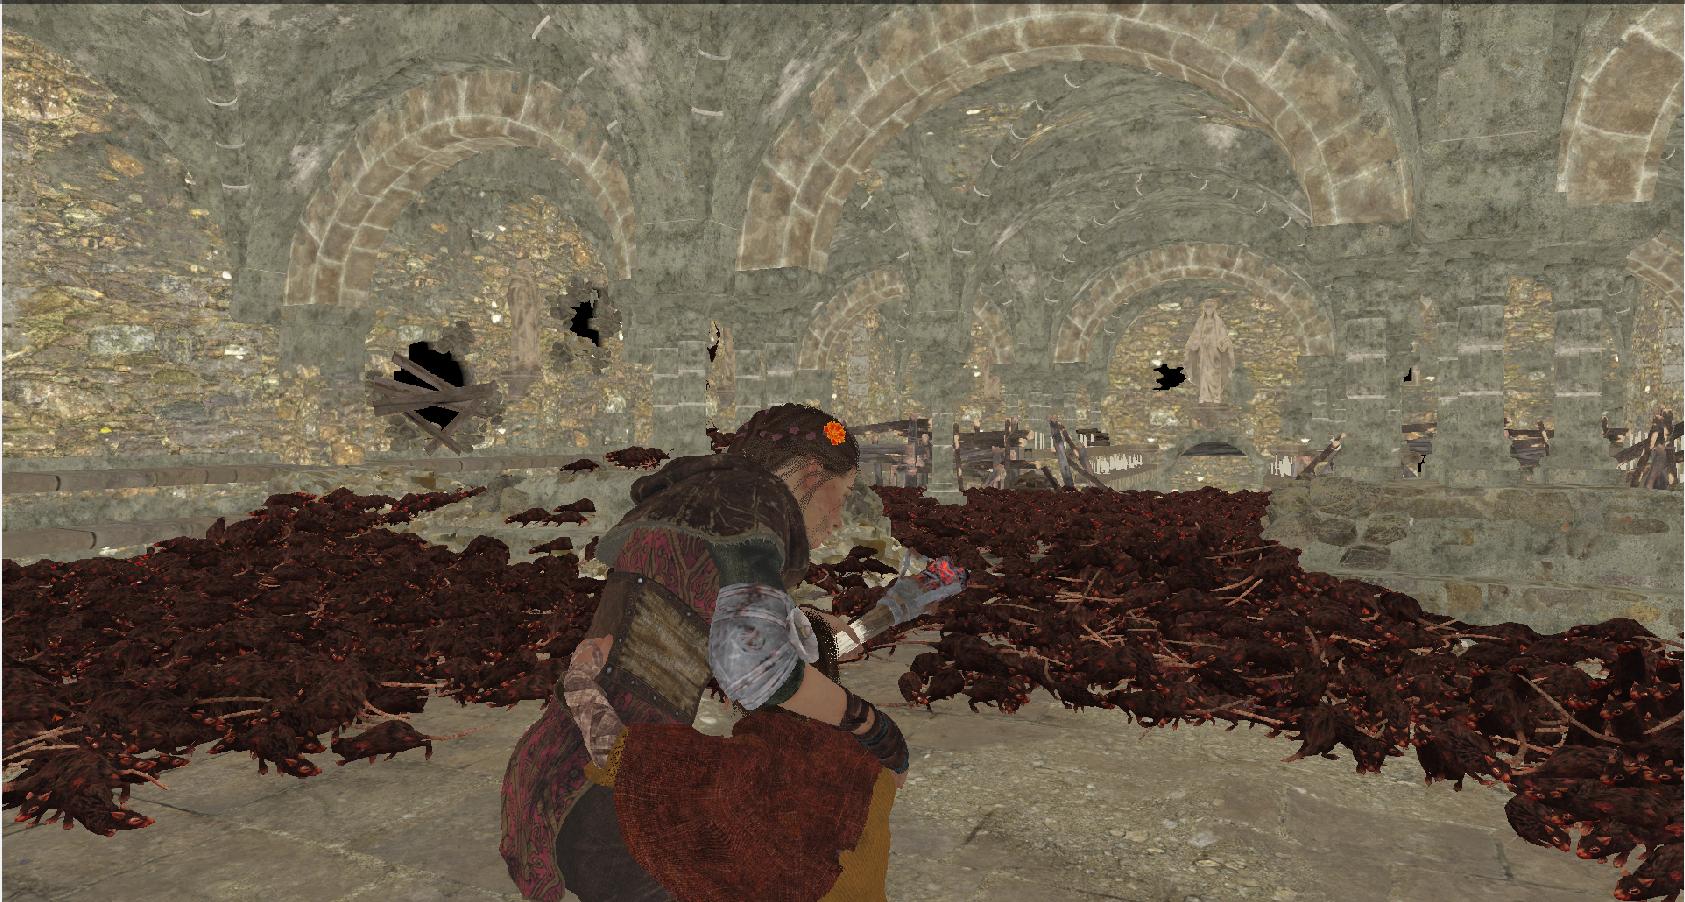 Как происходит рендеринг кадра A Plague Tale: Innocence - 22